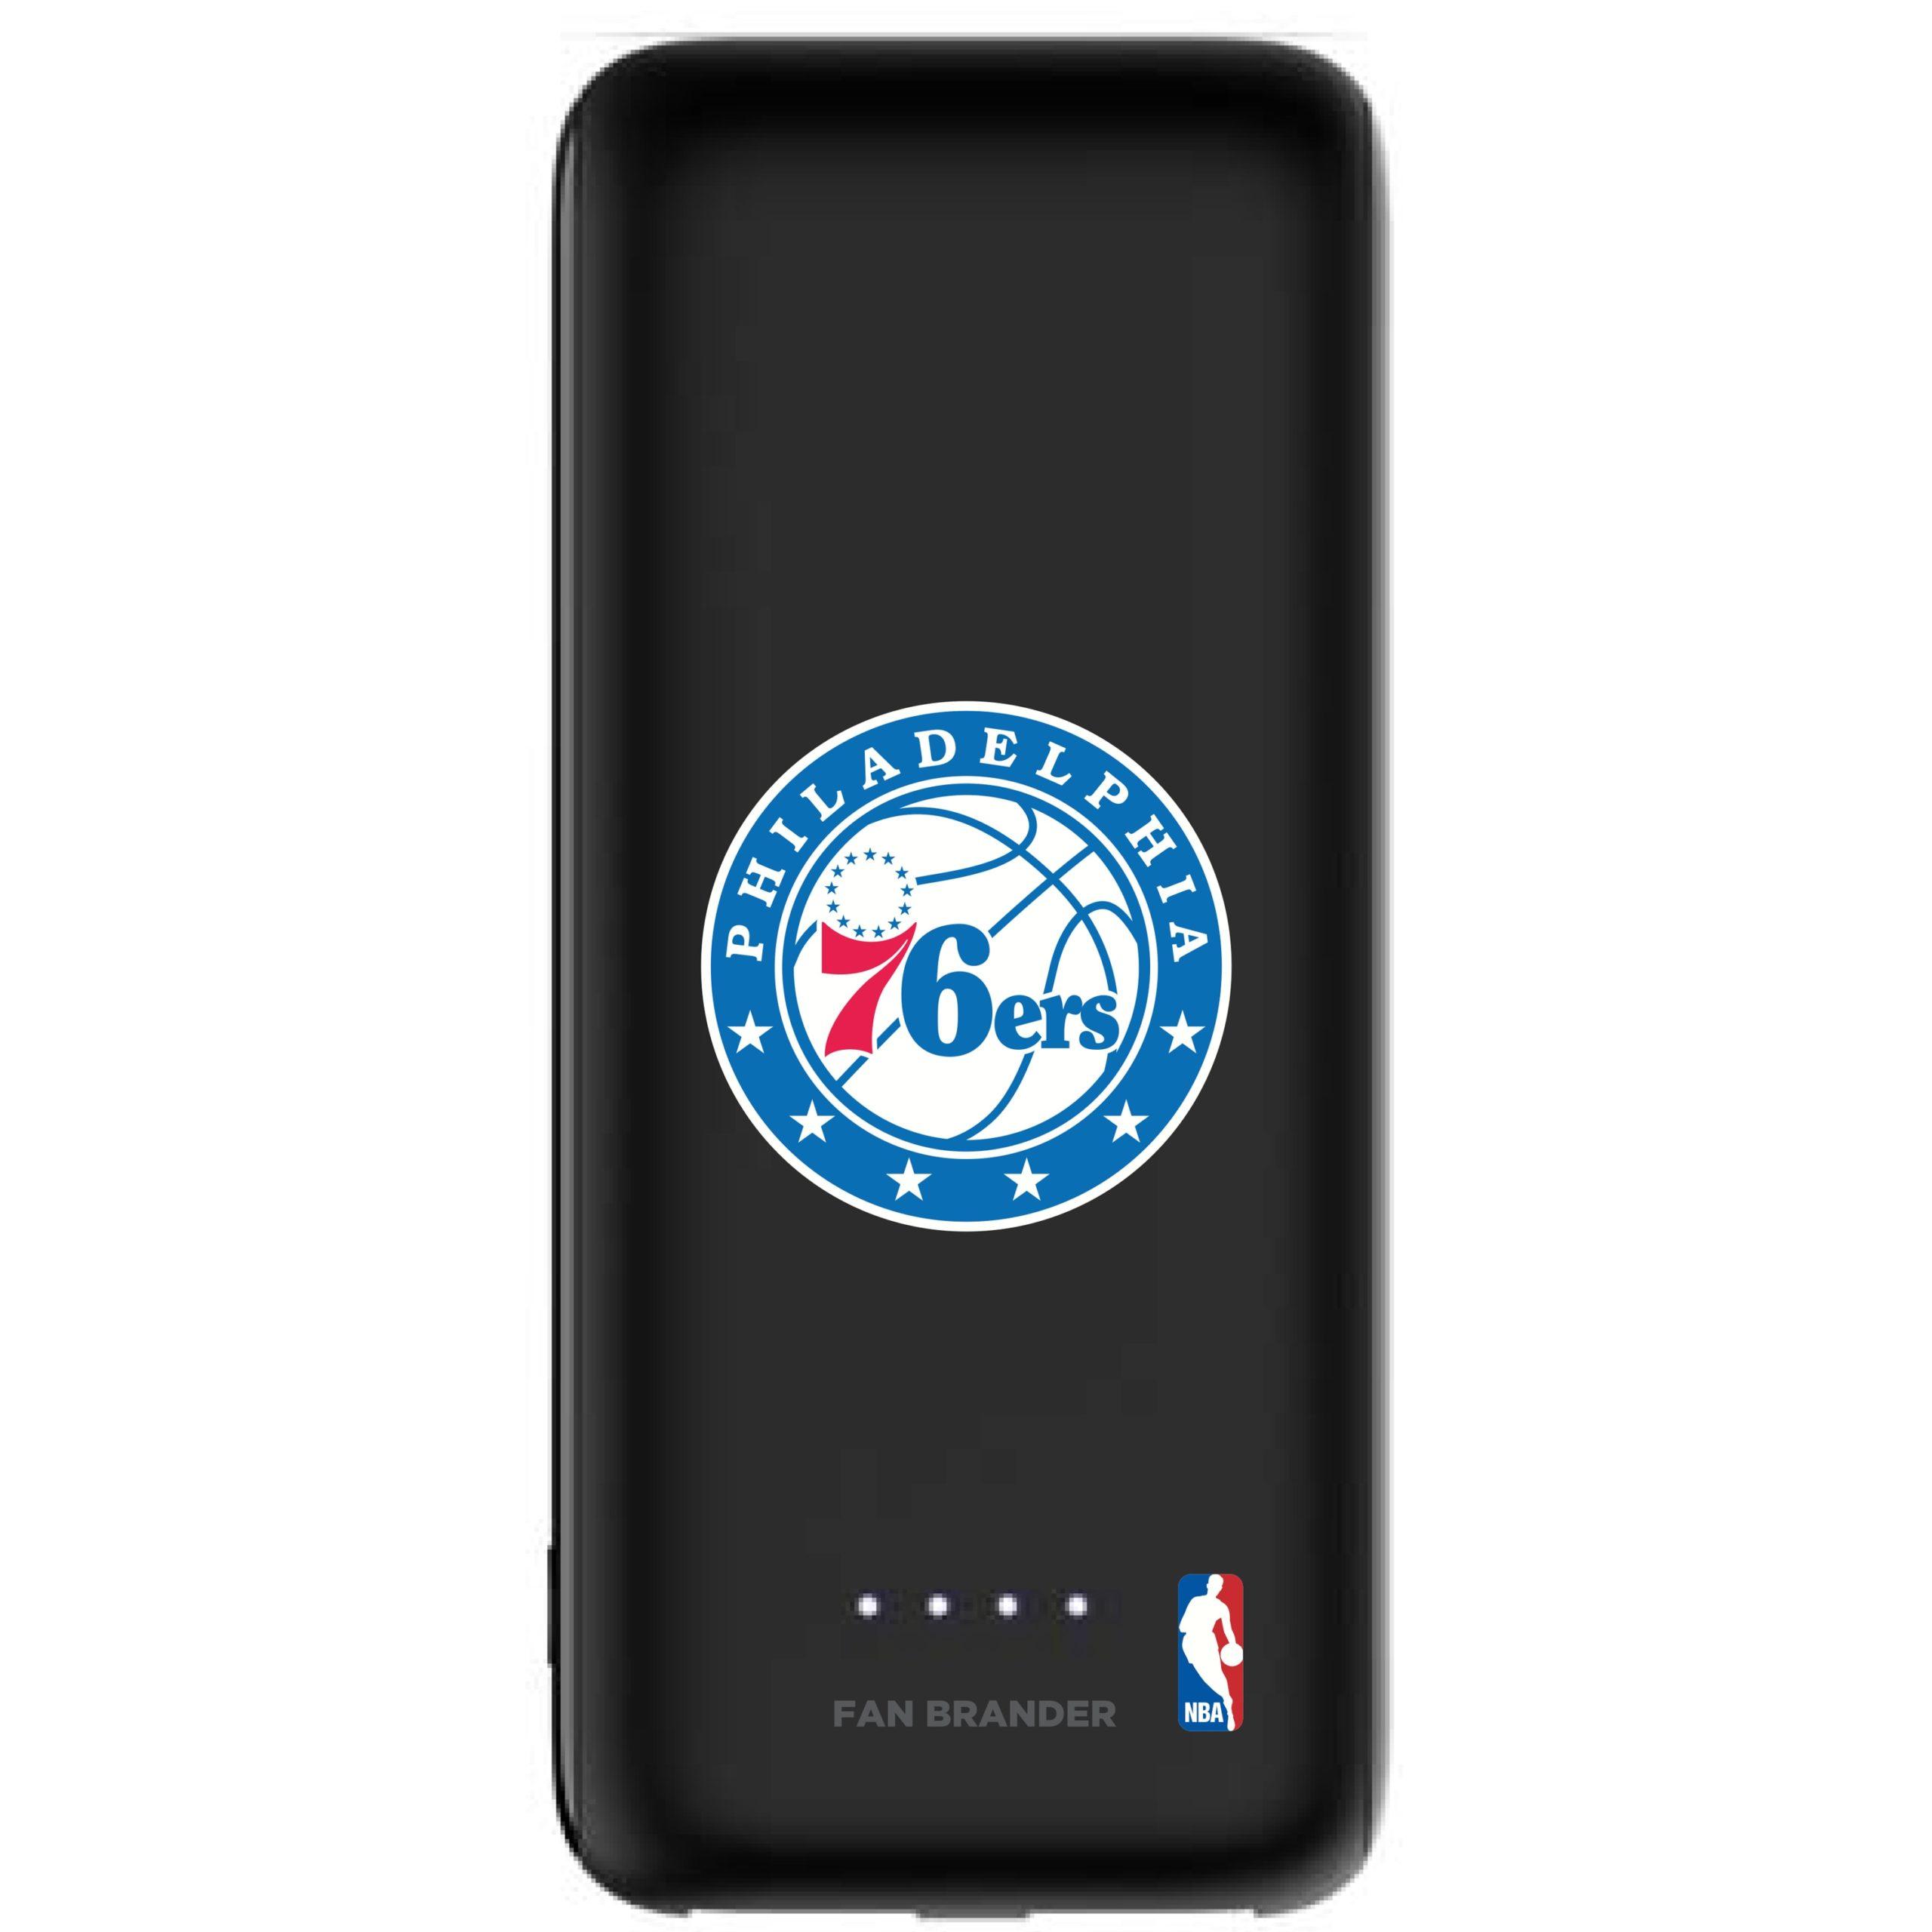 Philadelphia 76ers mophie 5200 mAh Universal Battery Power Boost